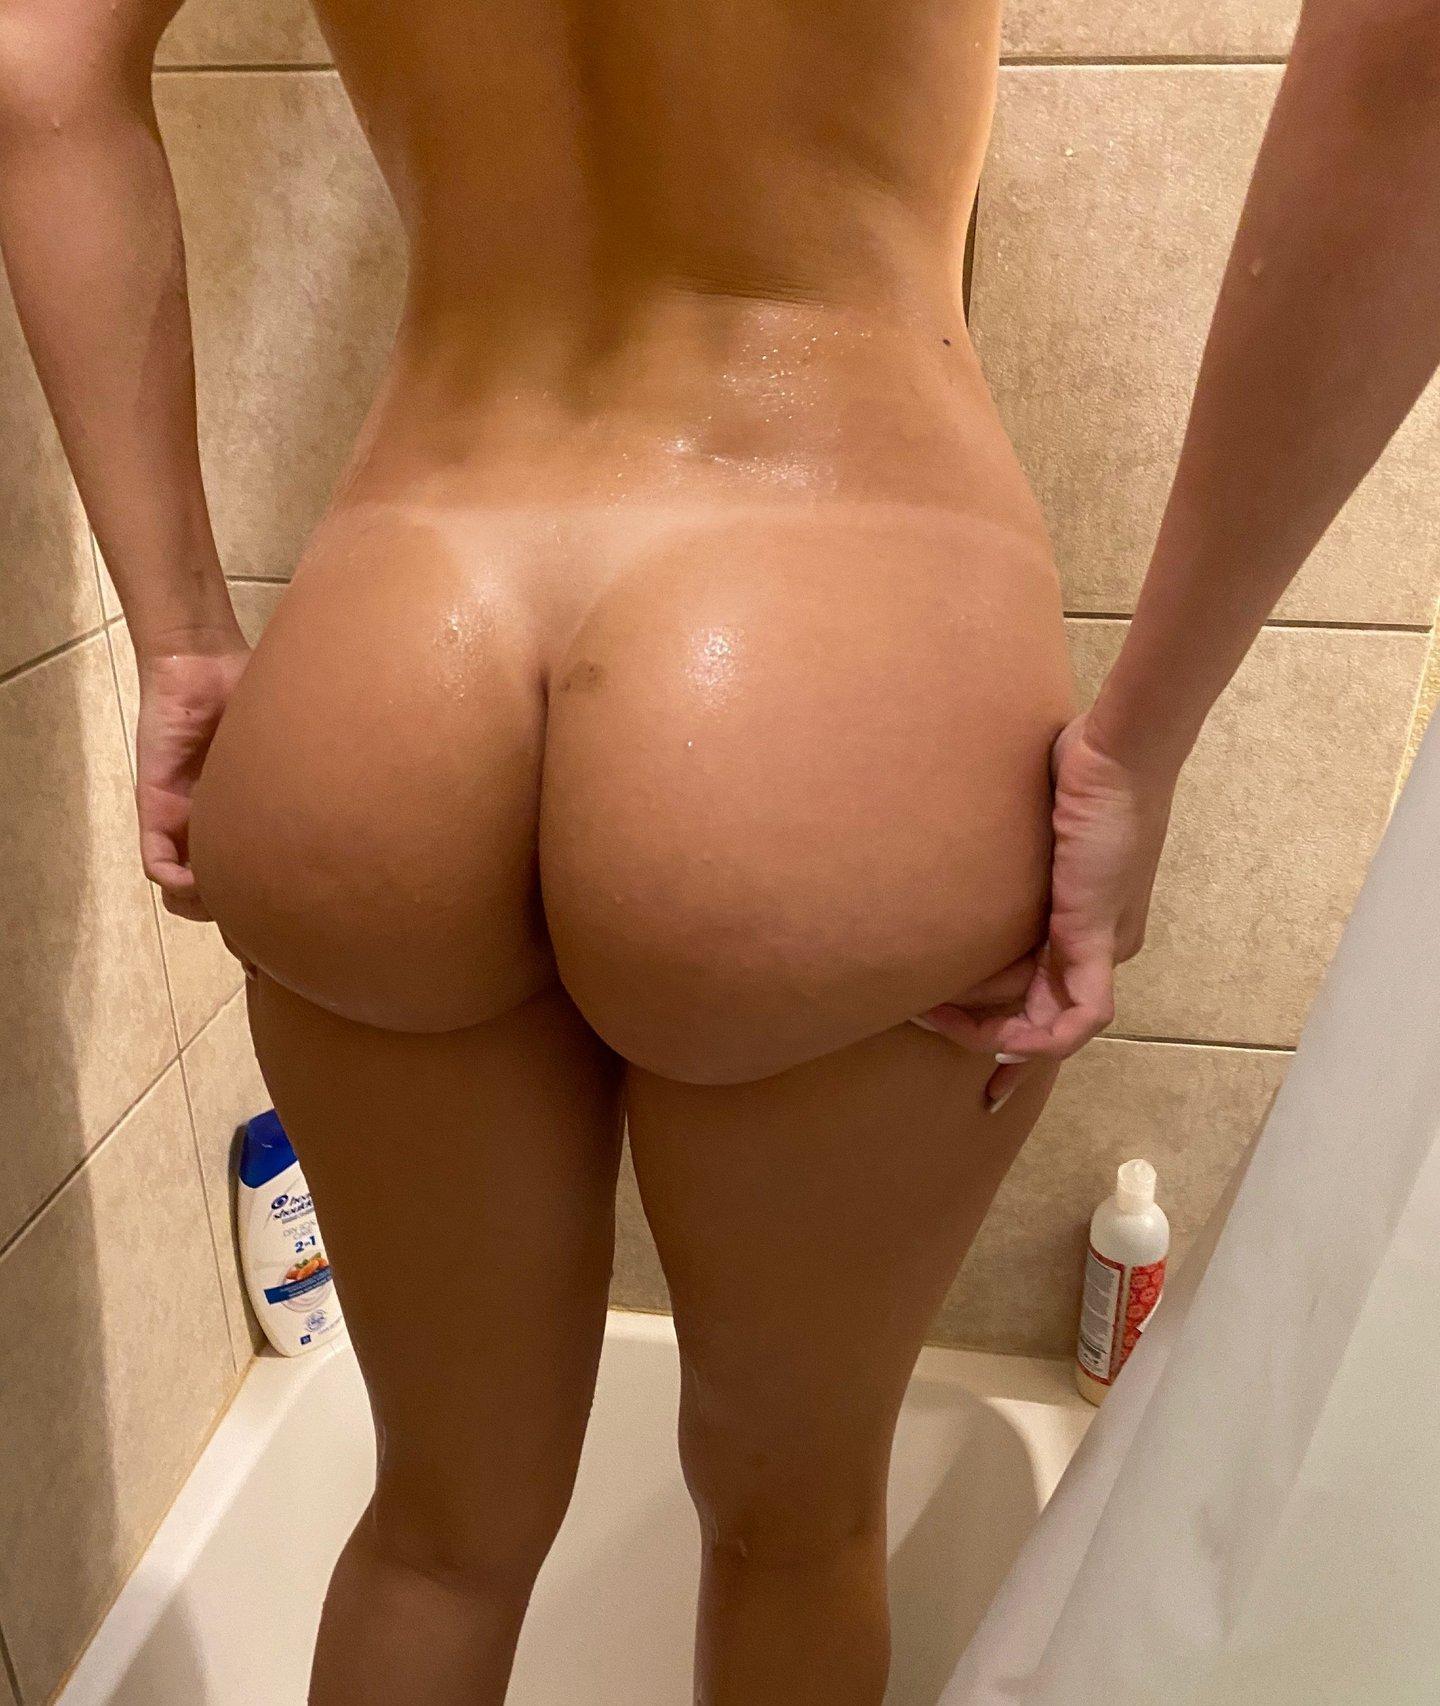 Alliecatt Alliecattxoxo Onlyfans Nude Leaks 0020